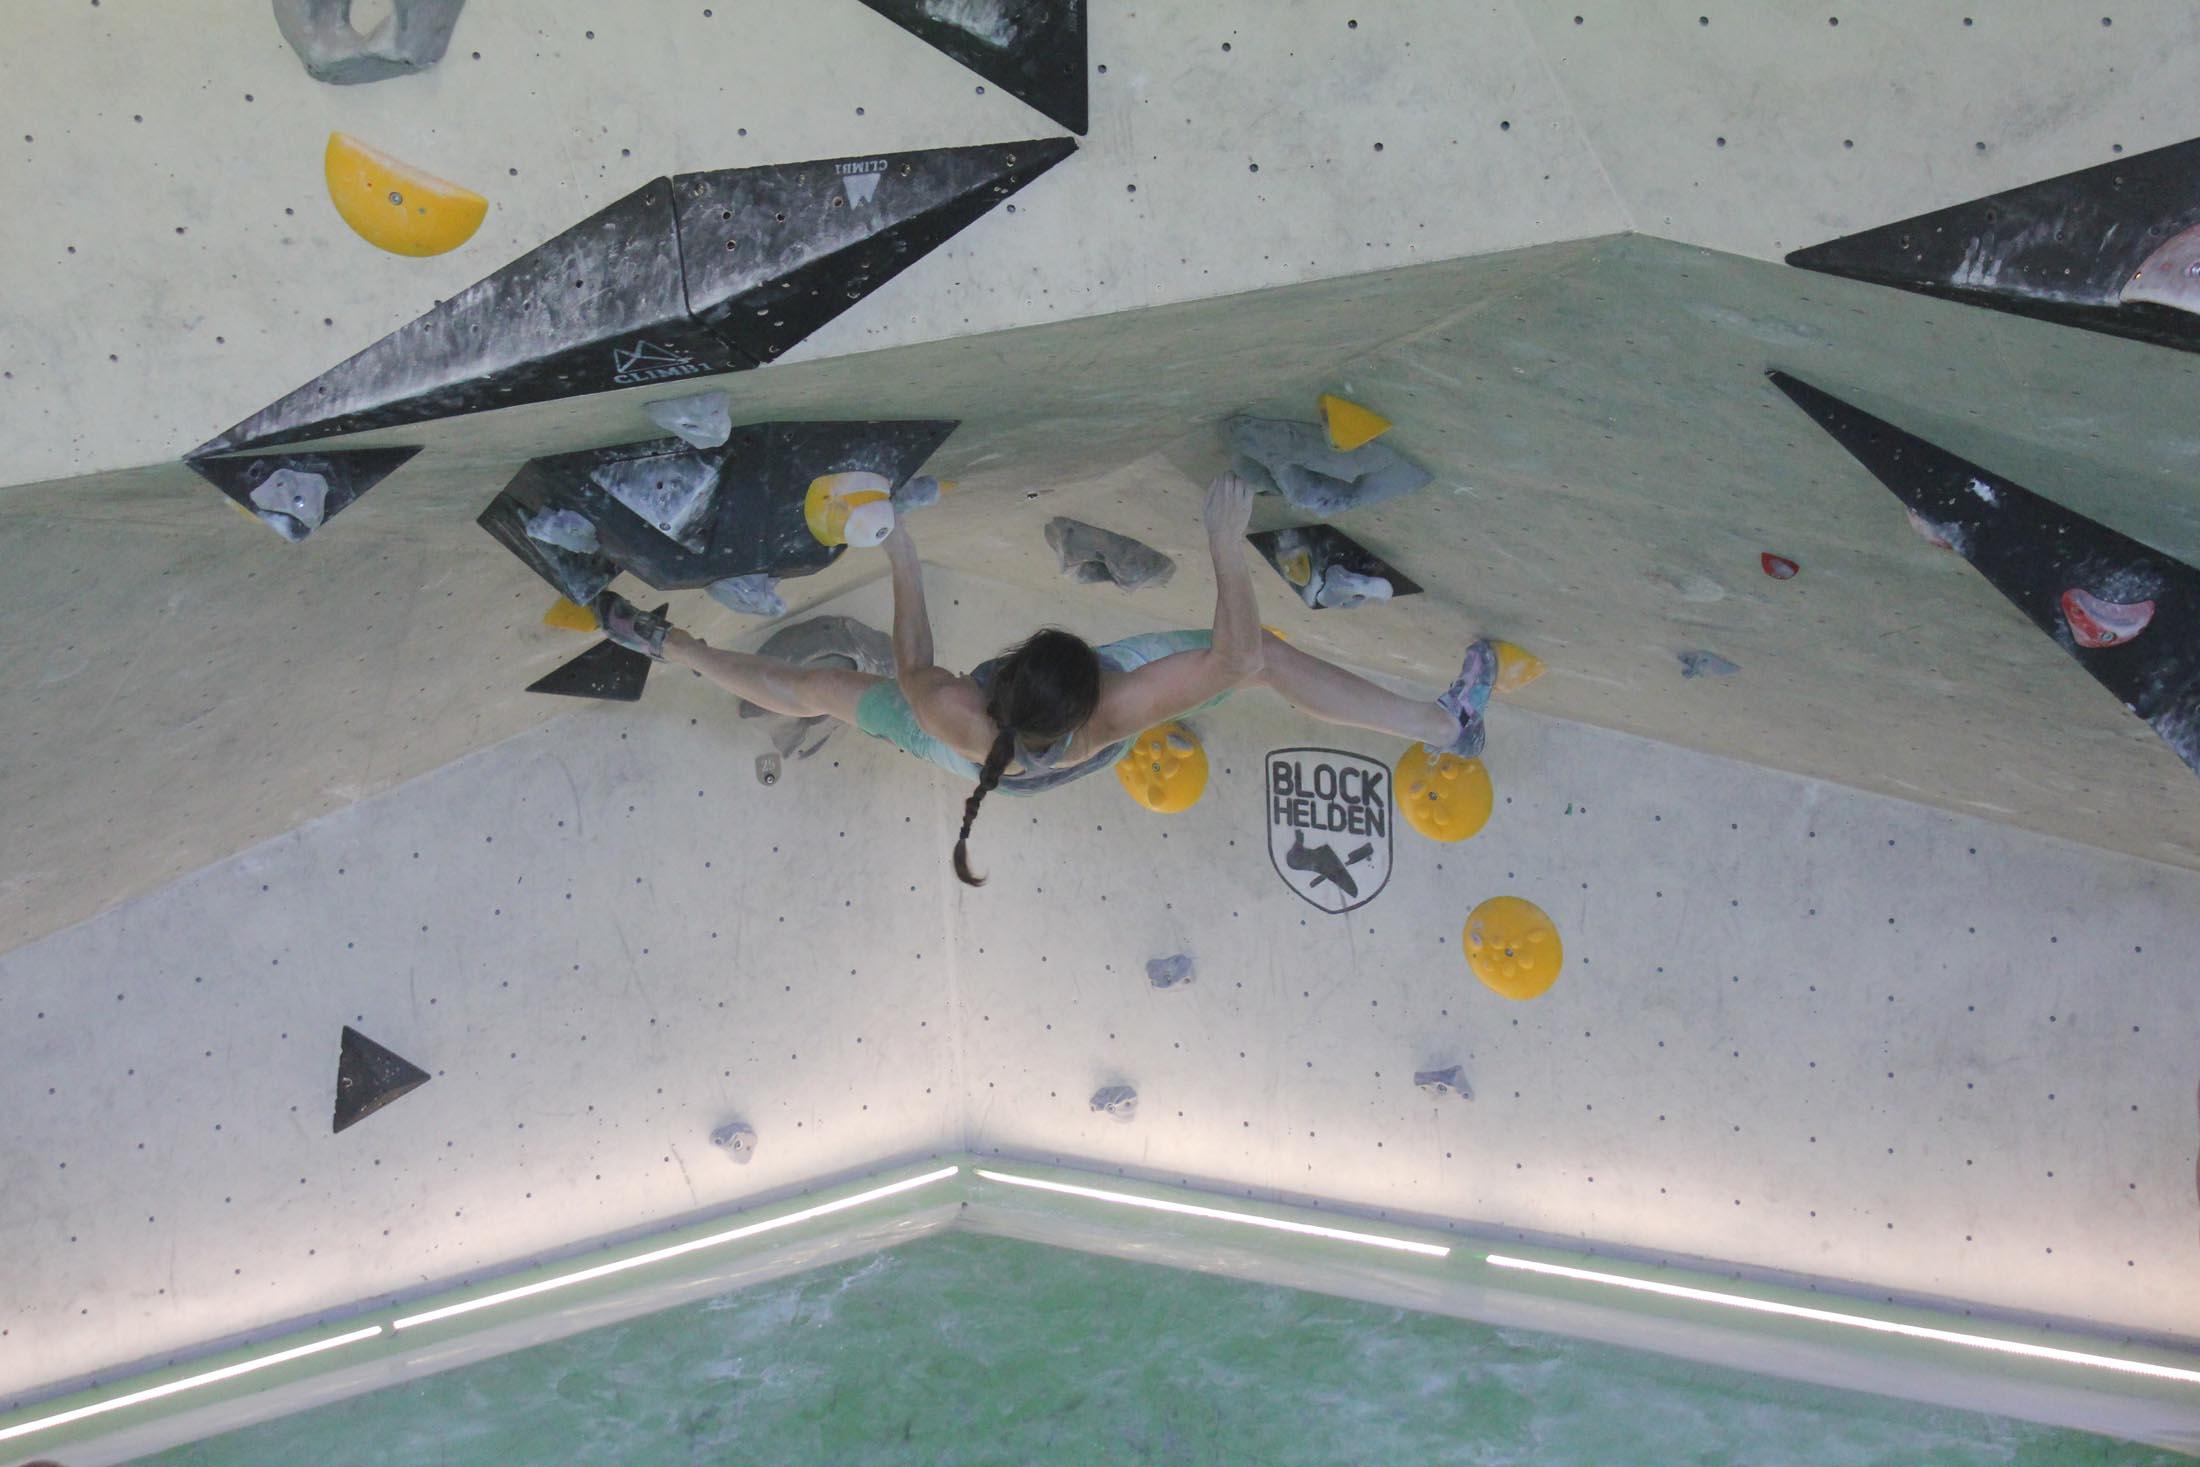 Juliane Wurm, internationaler bouldercup Frankenjura, BLOCKHELDEN Erlangen, Bergfreunde.de, Mammut07092016011